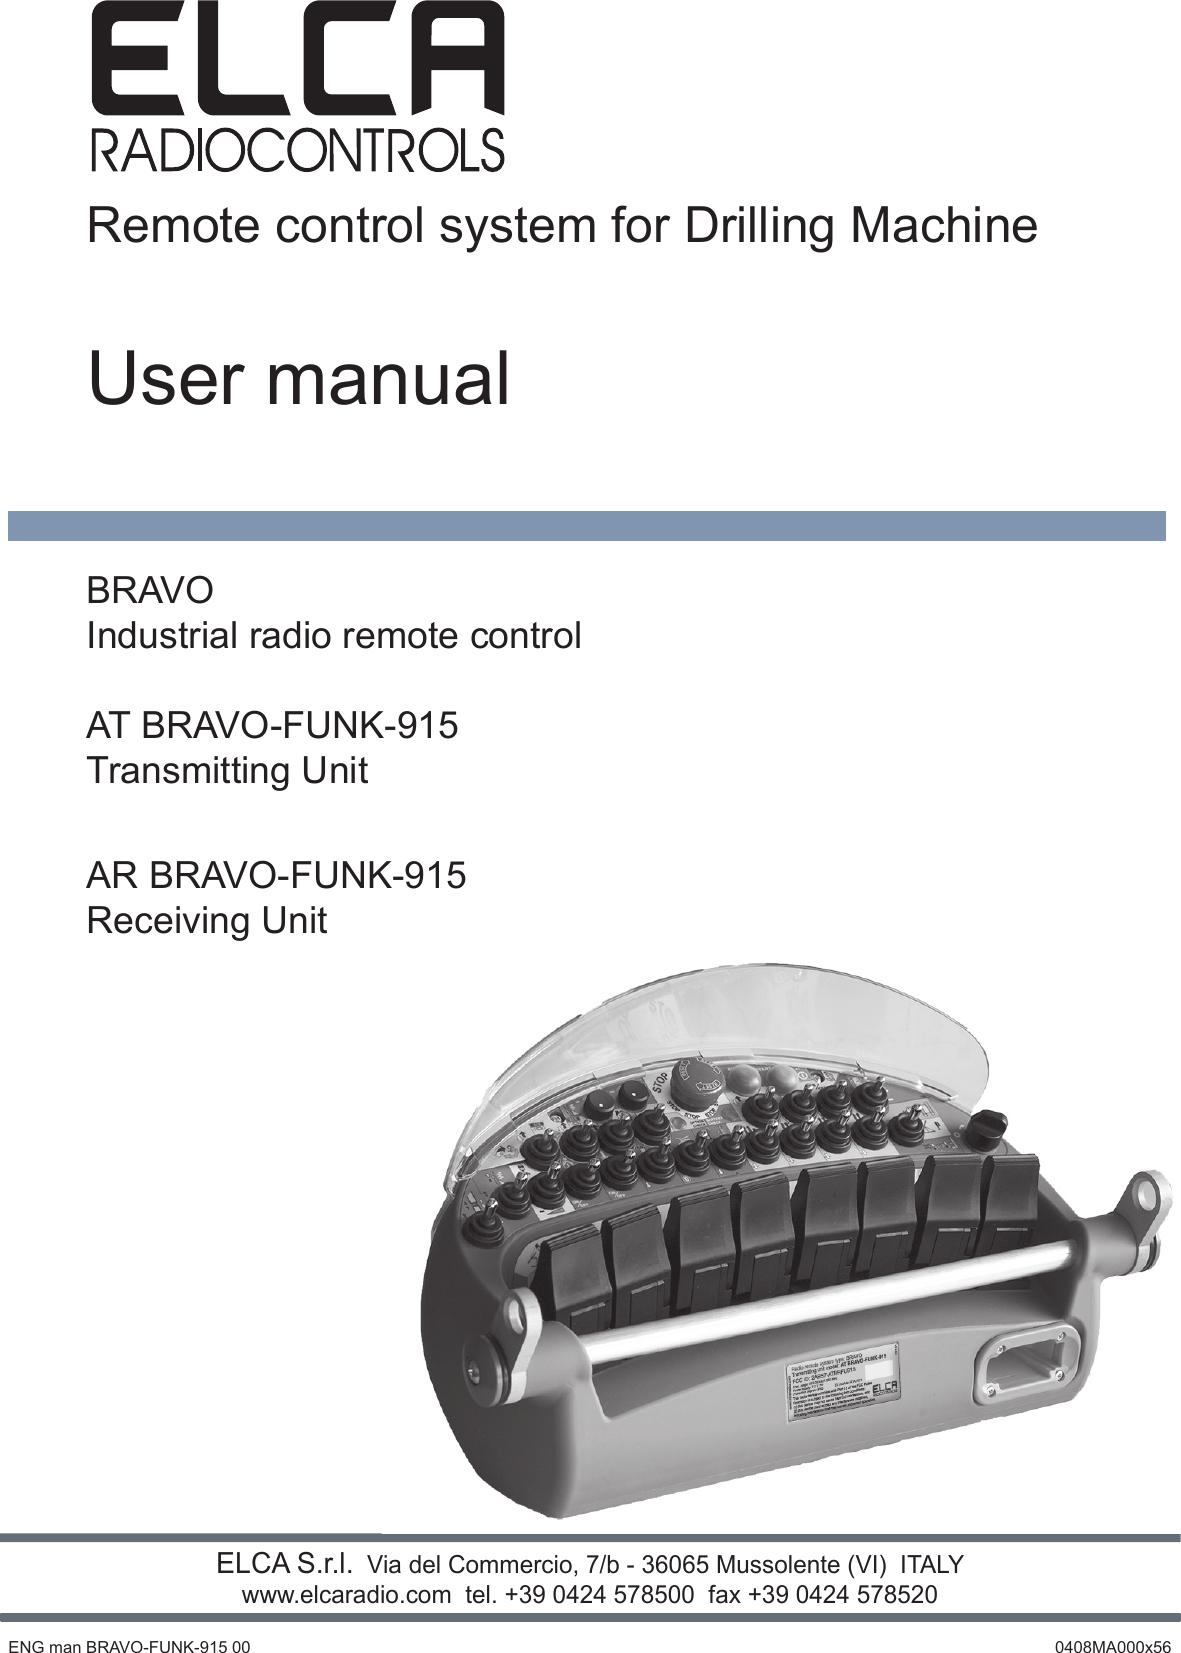 Elca S R L Arbrfu915 Transceiver Unit User Manual Manuale Sistema Add A Fuse Circuit 39mini Low Profile Aps39 Blade Holder Fusebox Radiocomando Mago Evo